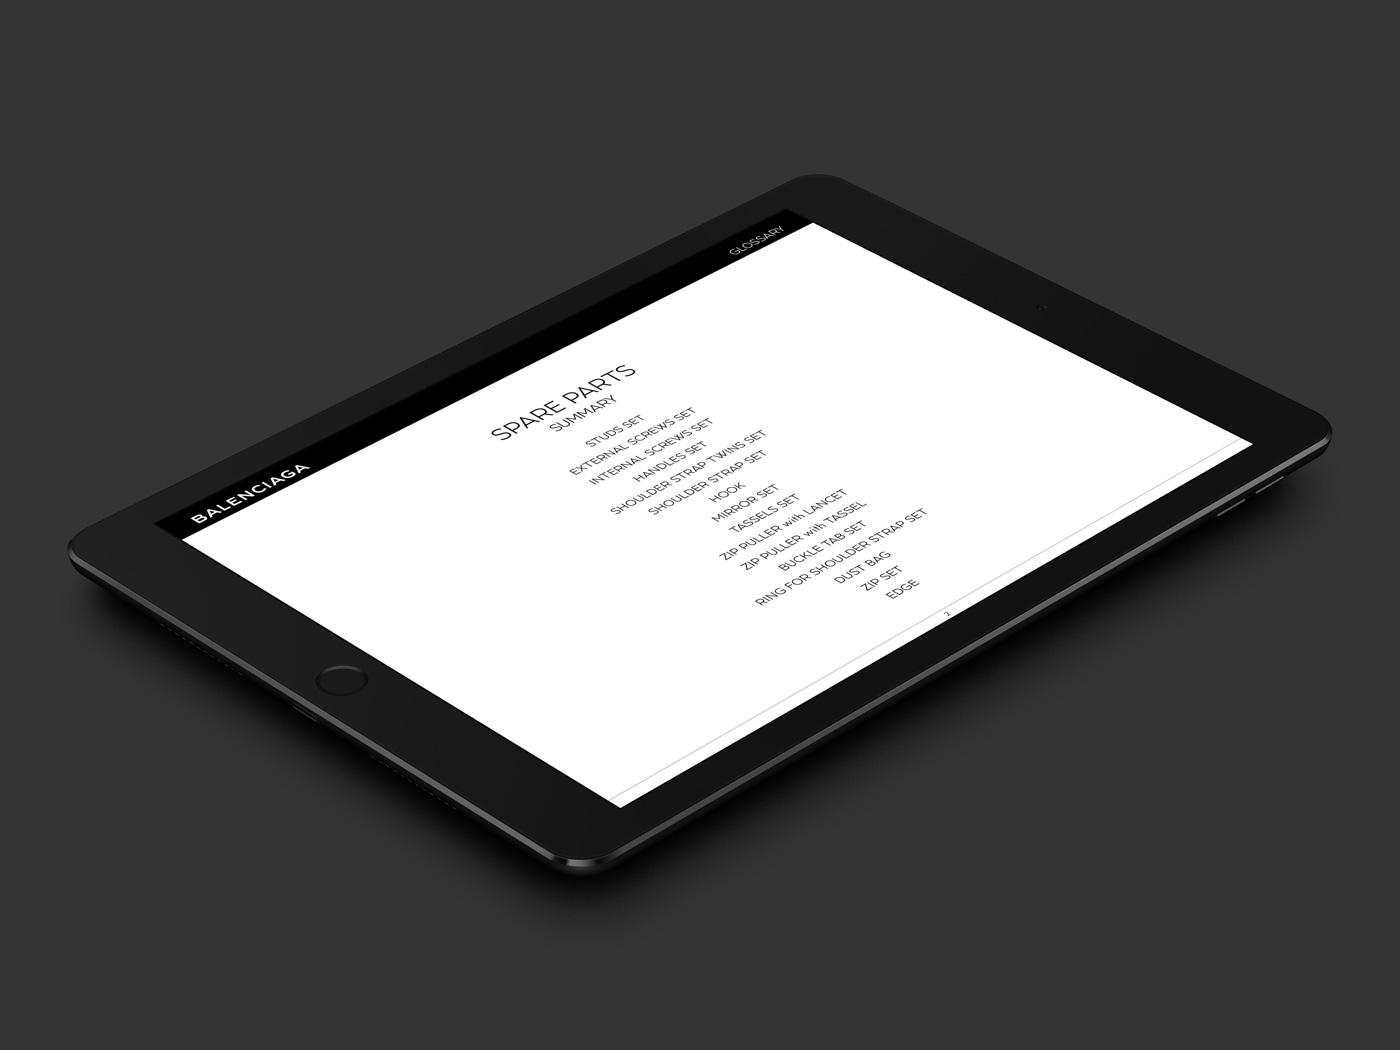 Balenciaga Glossary, service après vente ebook